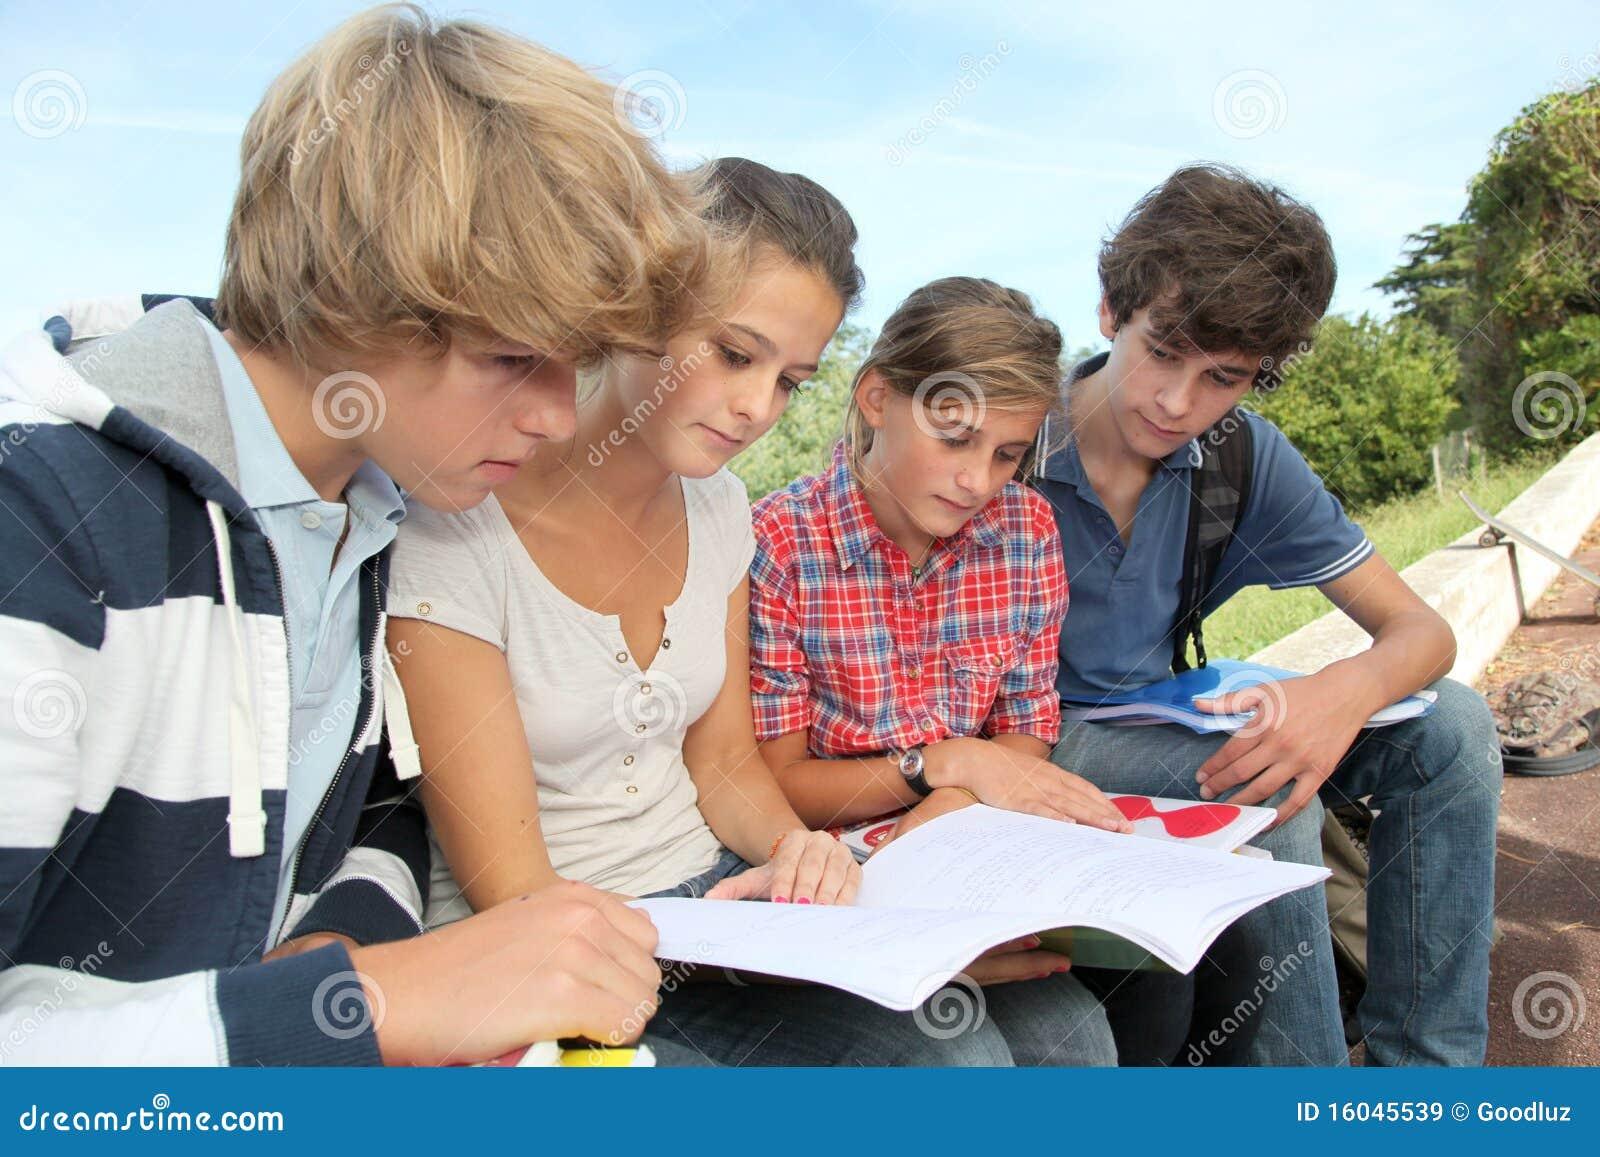 Students with handbooks in school yard